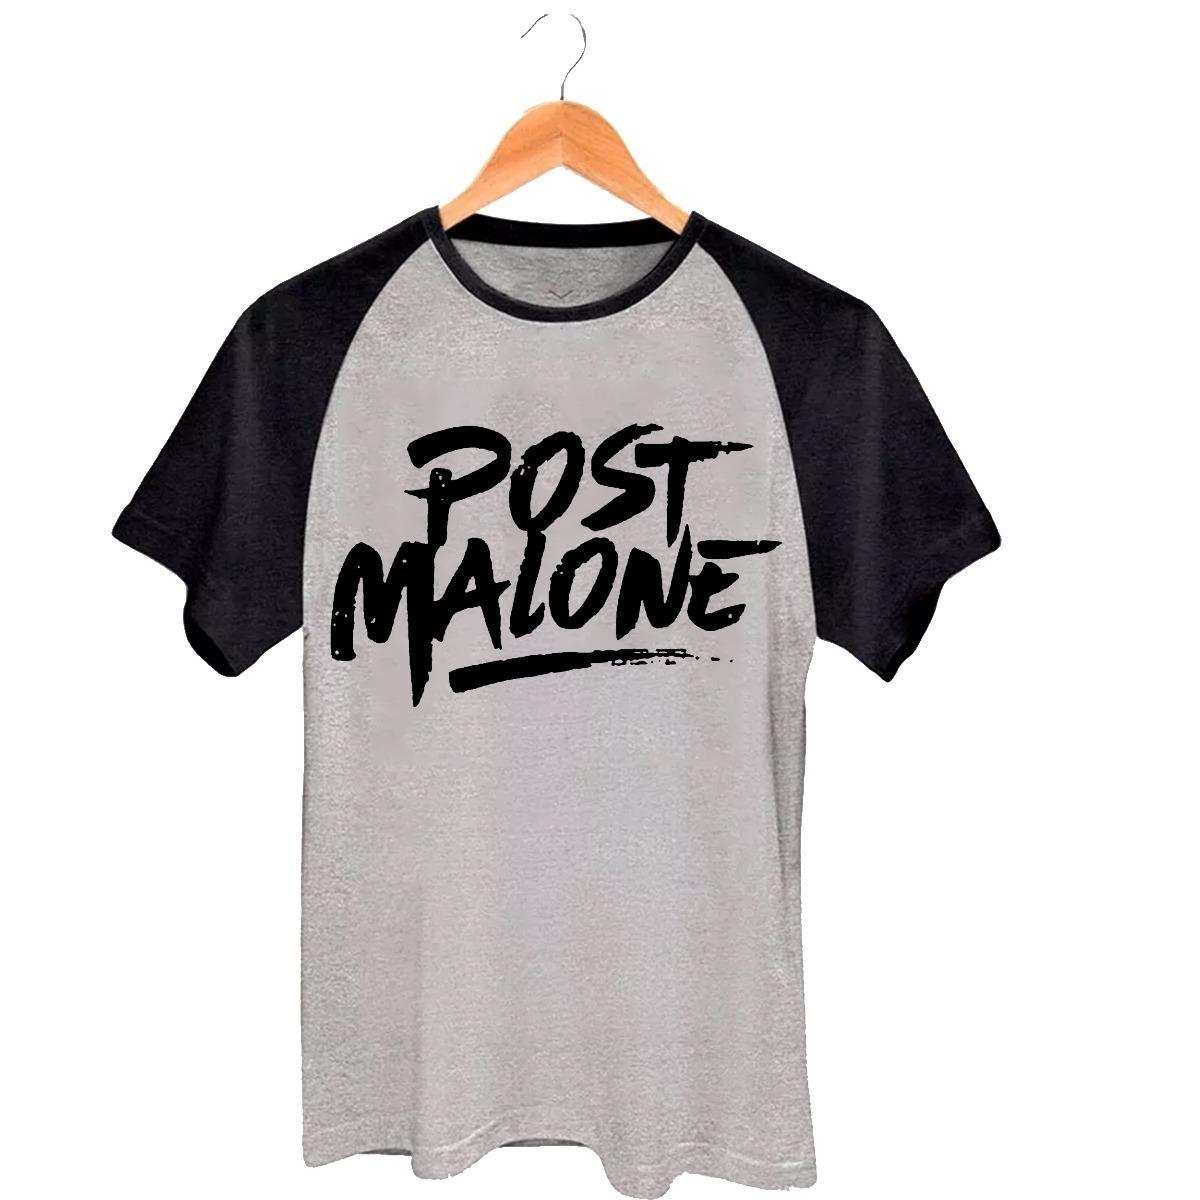 03db1612f camiseta raglan camisa roupa rapper post malone unissex. Carregando zoom.